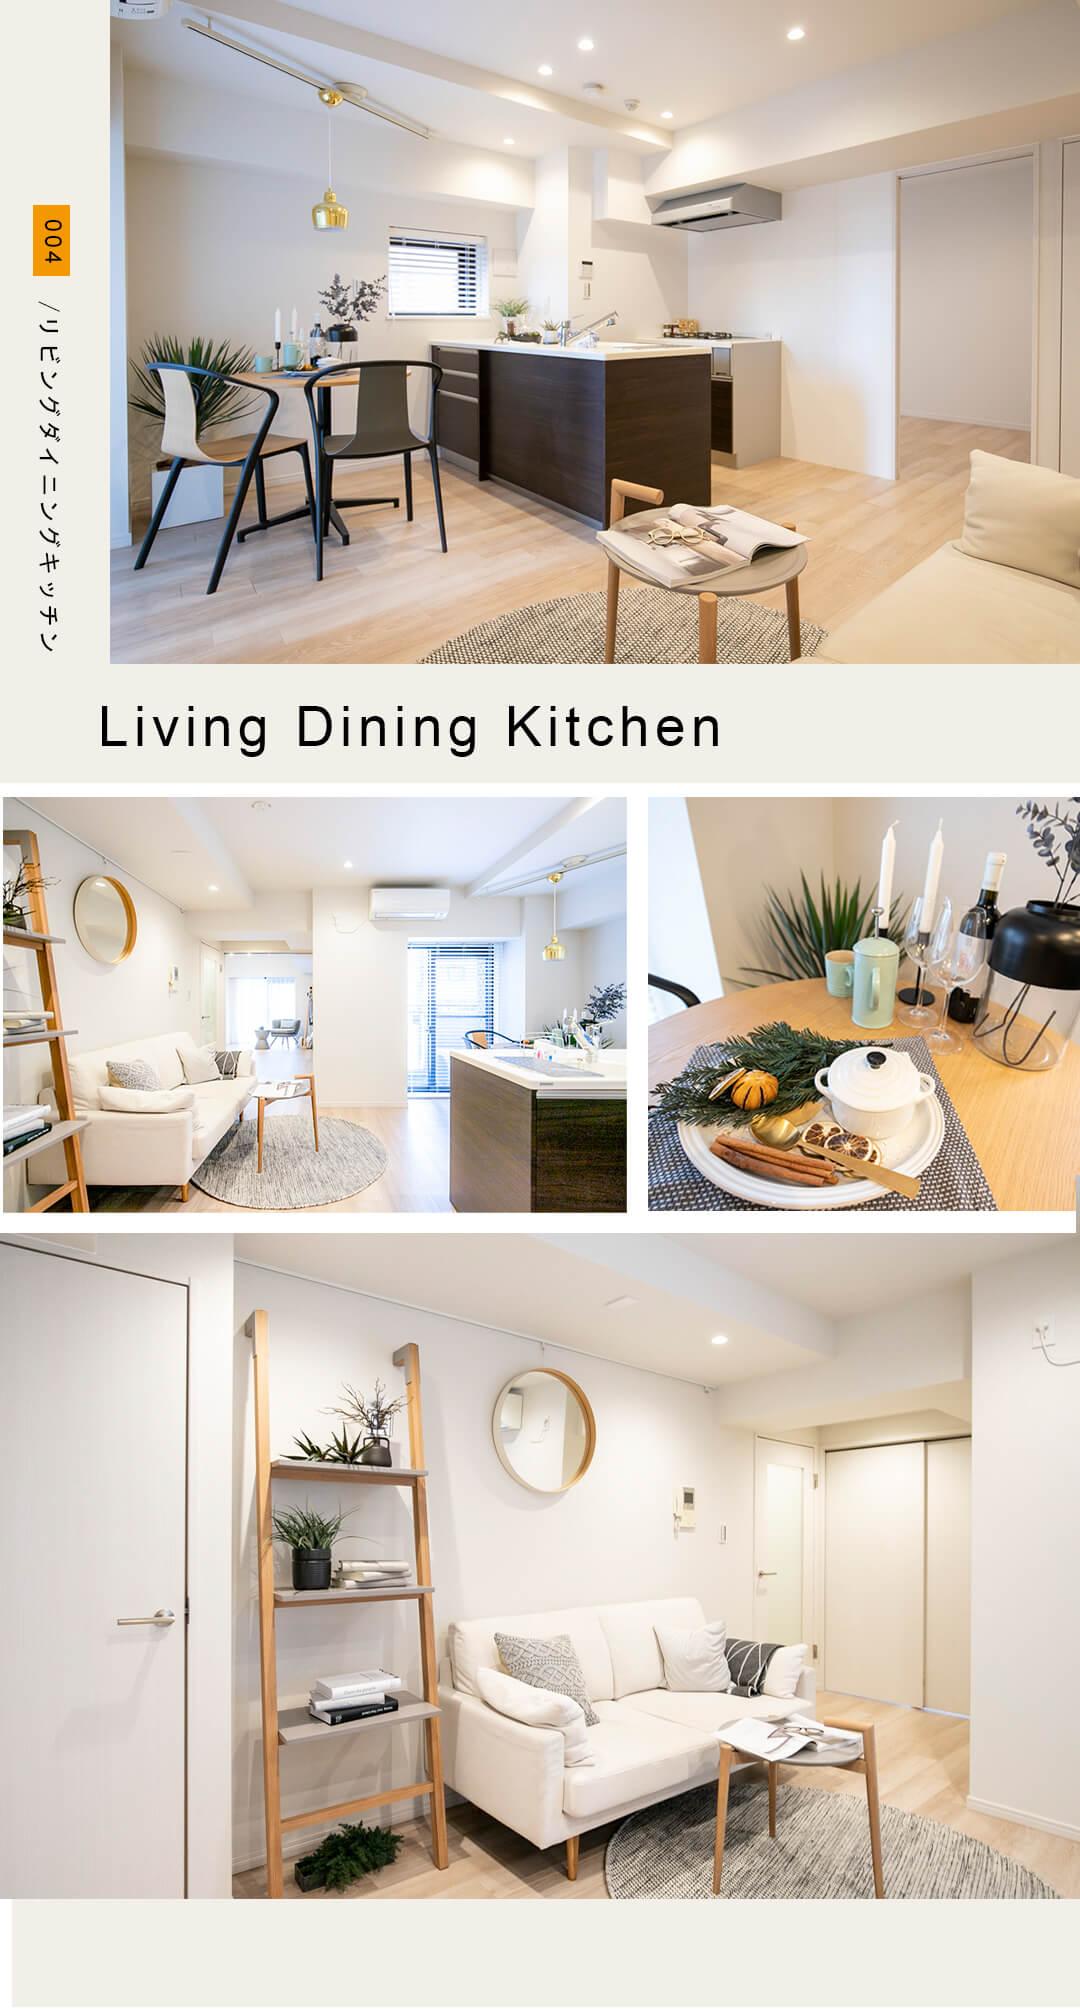 004,LivingDiningKitchen,リビングダイニングキッチン